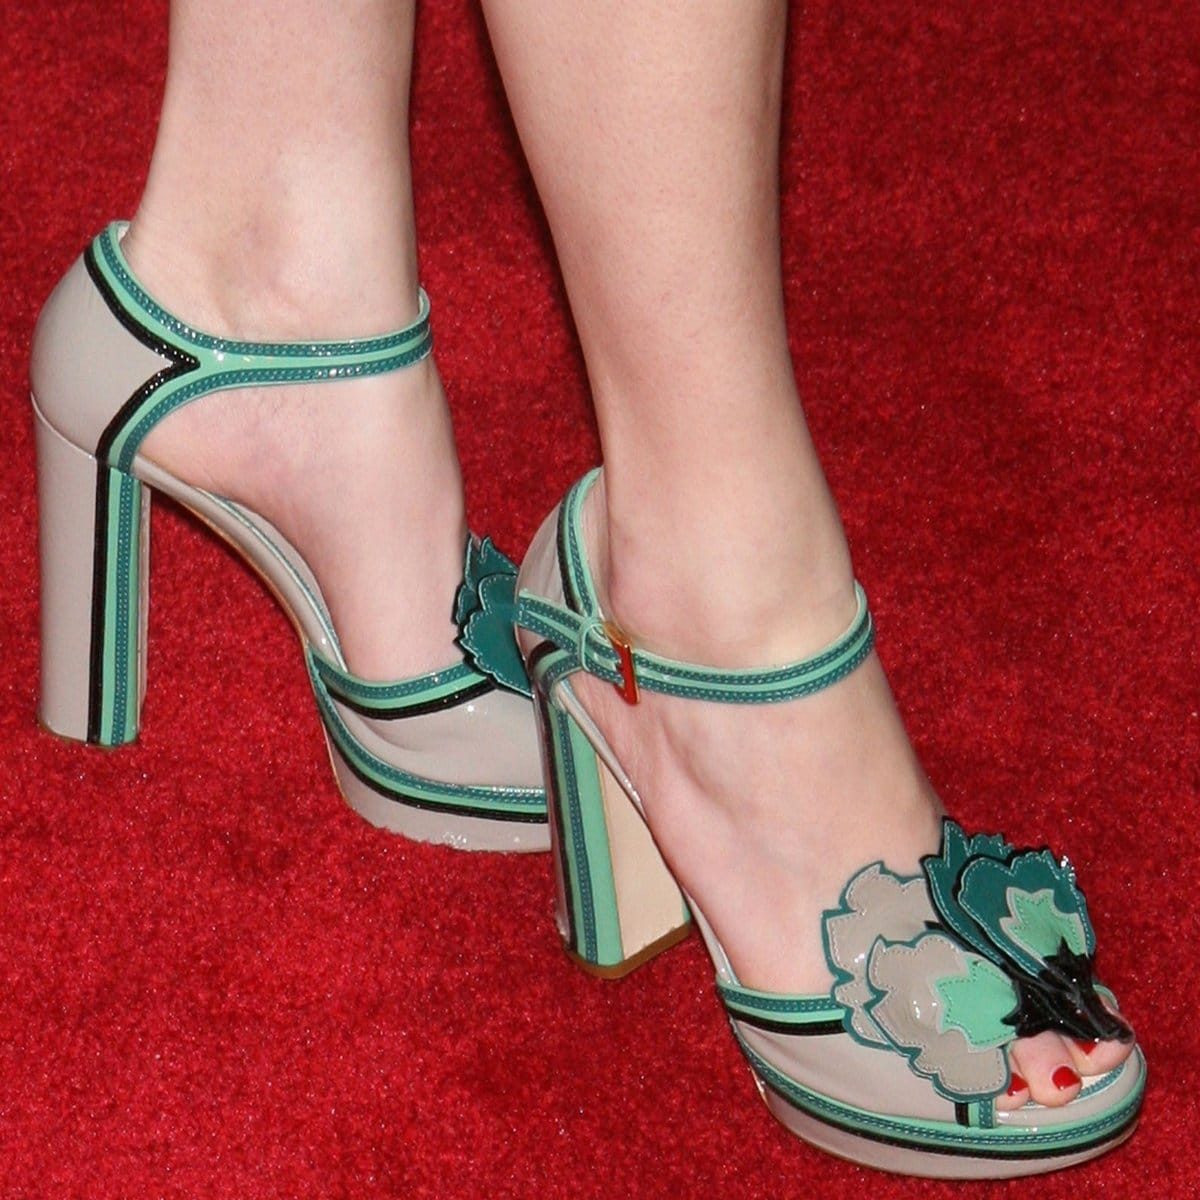 Elizabeth Banks shows off her size 7 (US) feet in high heels